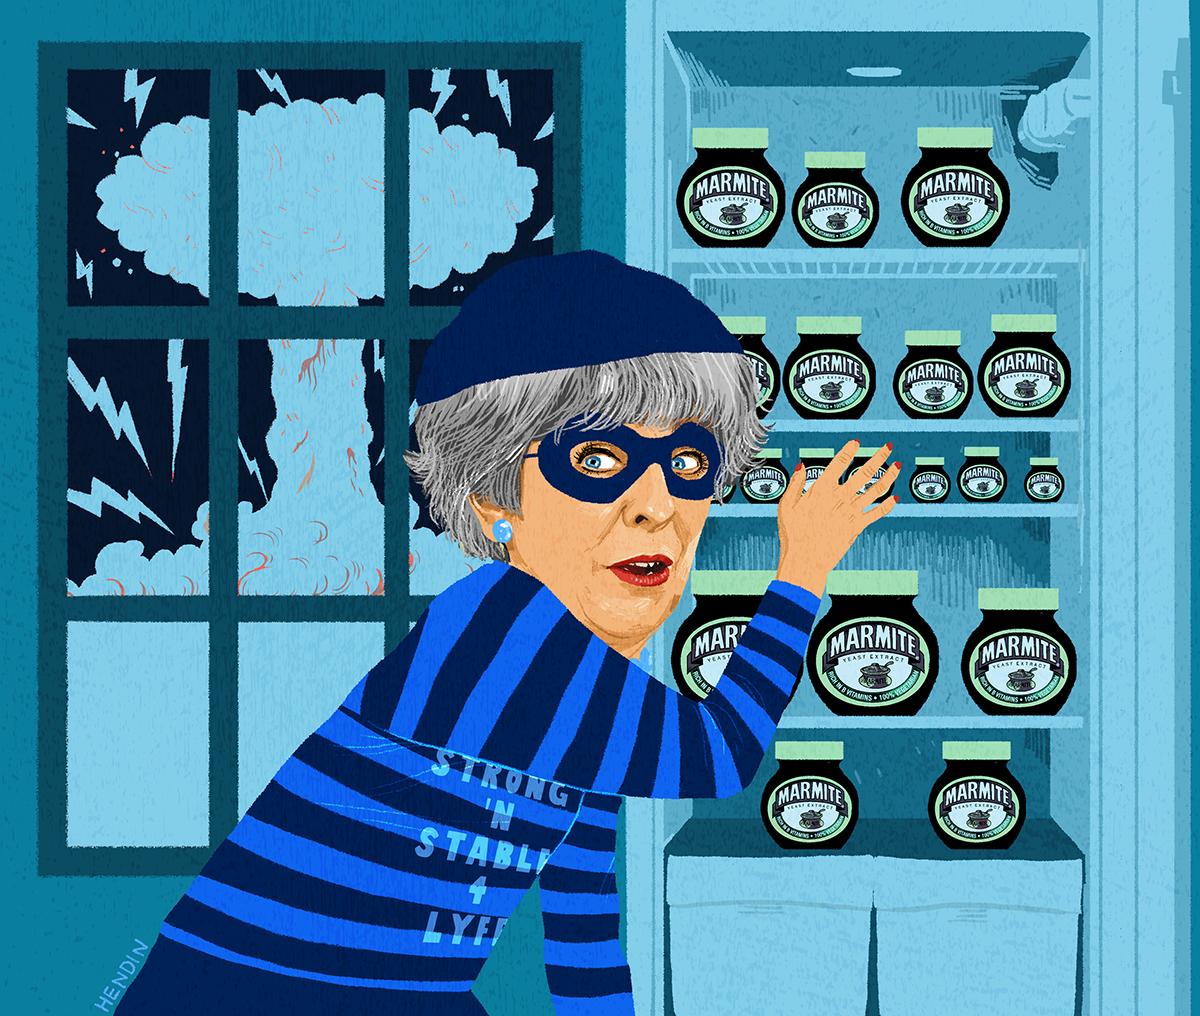 rebecca-hendin-buzzfeed-general-election-dream-tweets-illustration-may-1